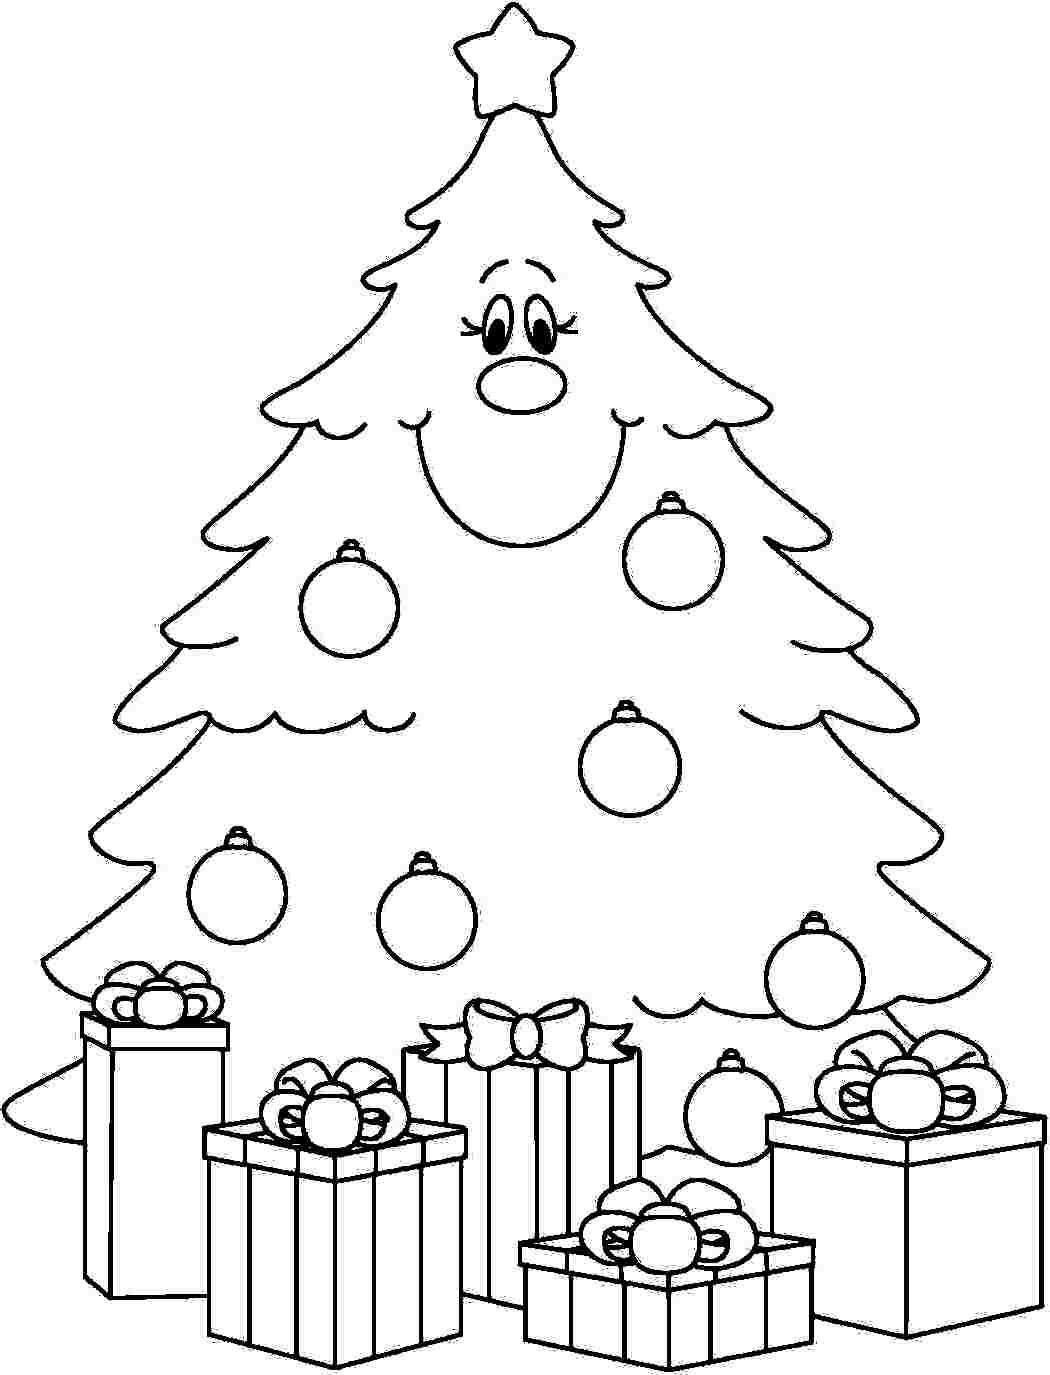 christmas tree coloring page christmas 2019 40 free printable christmas tree coloring coloring tree christmas page